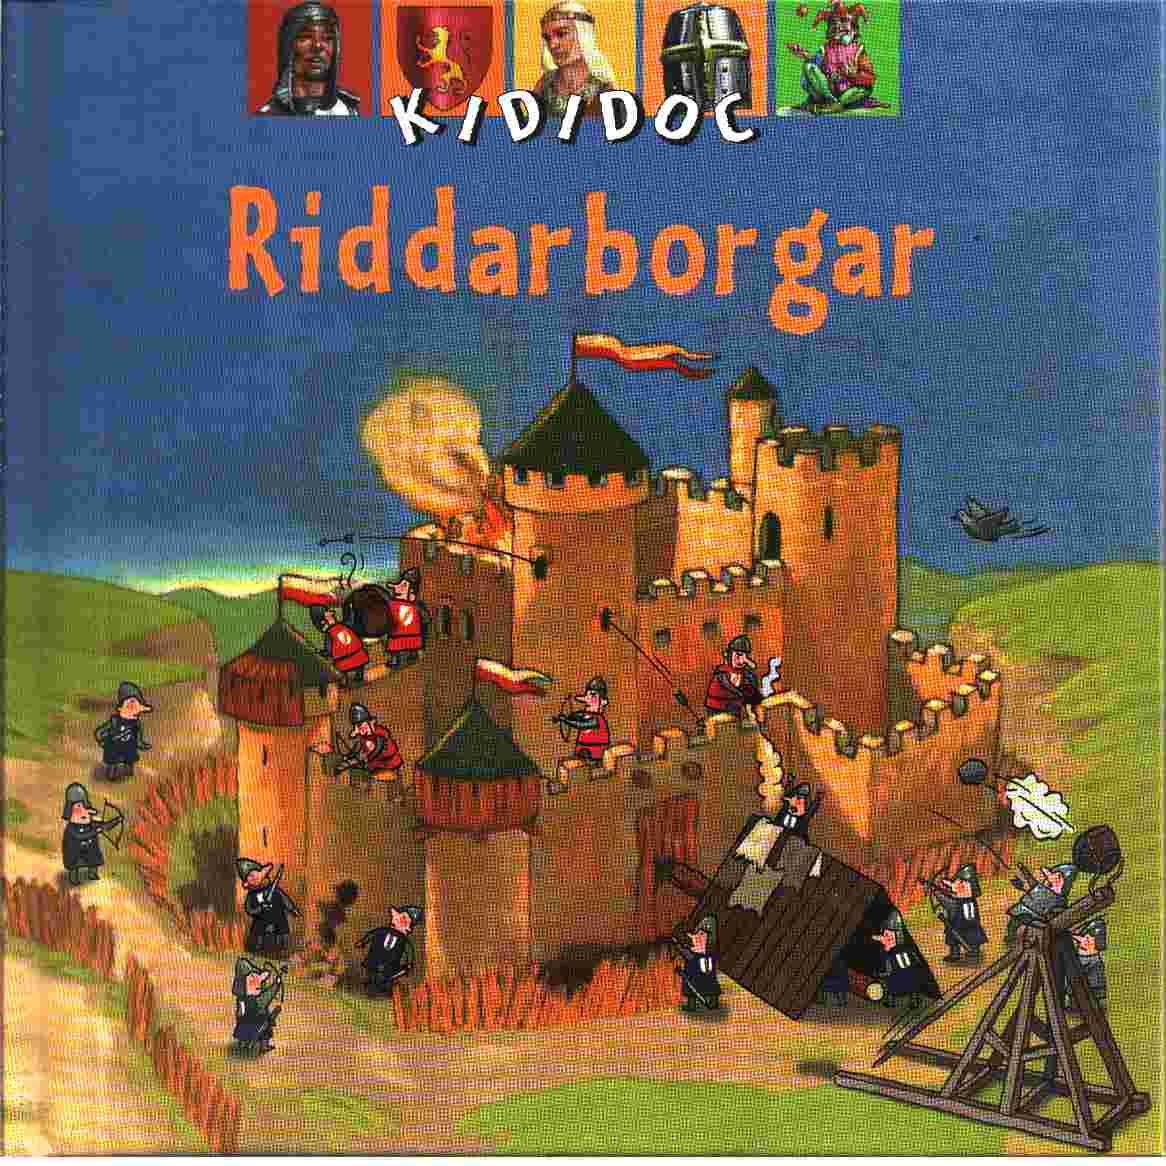 Riddarborgar - Longour, Michèle